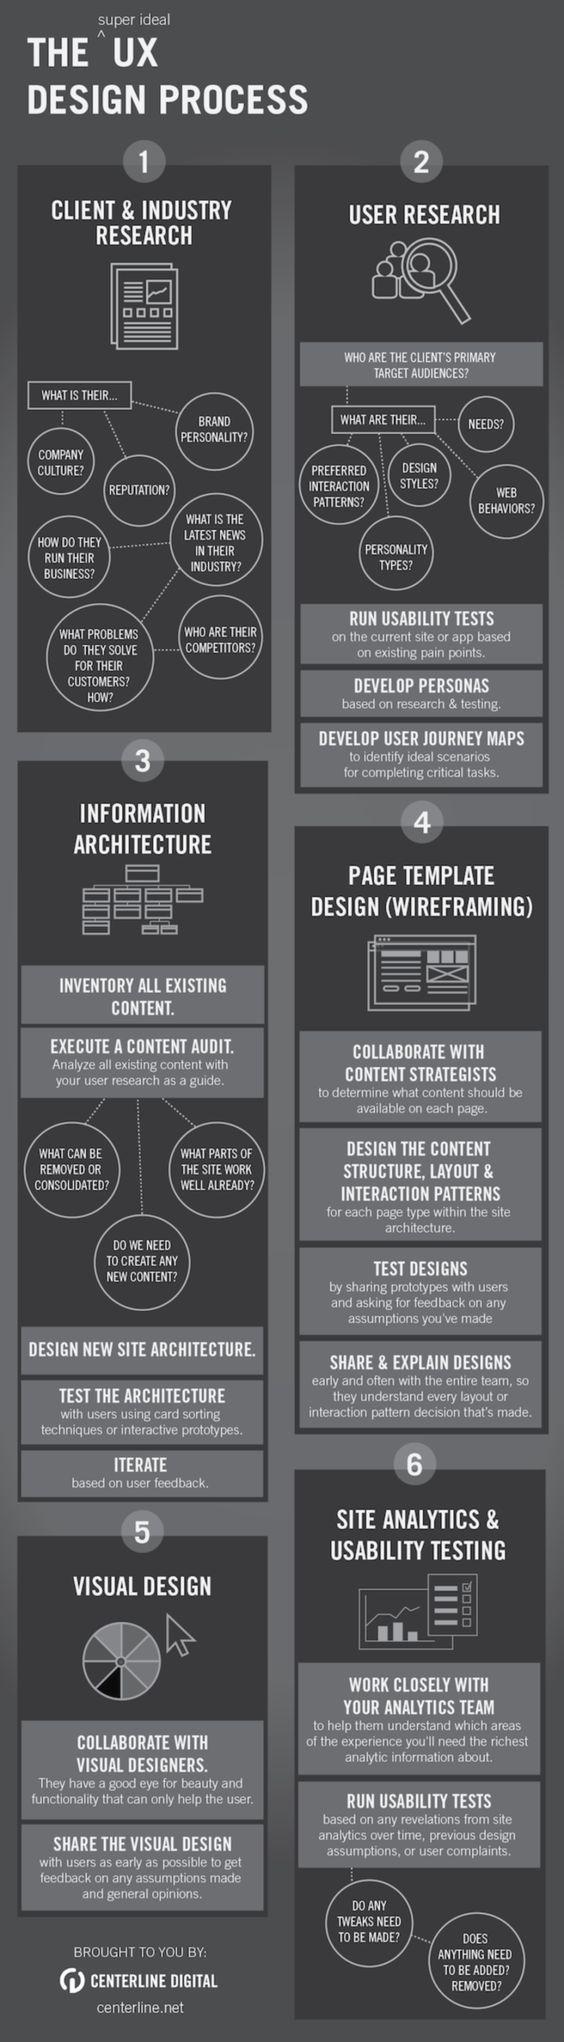 The UX design process  #UX #WebDesign